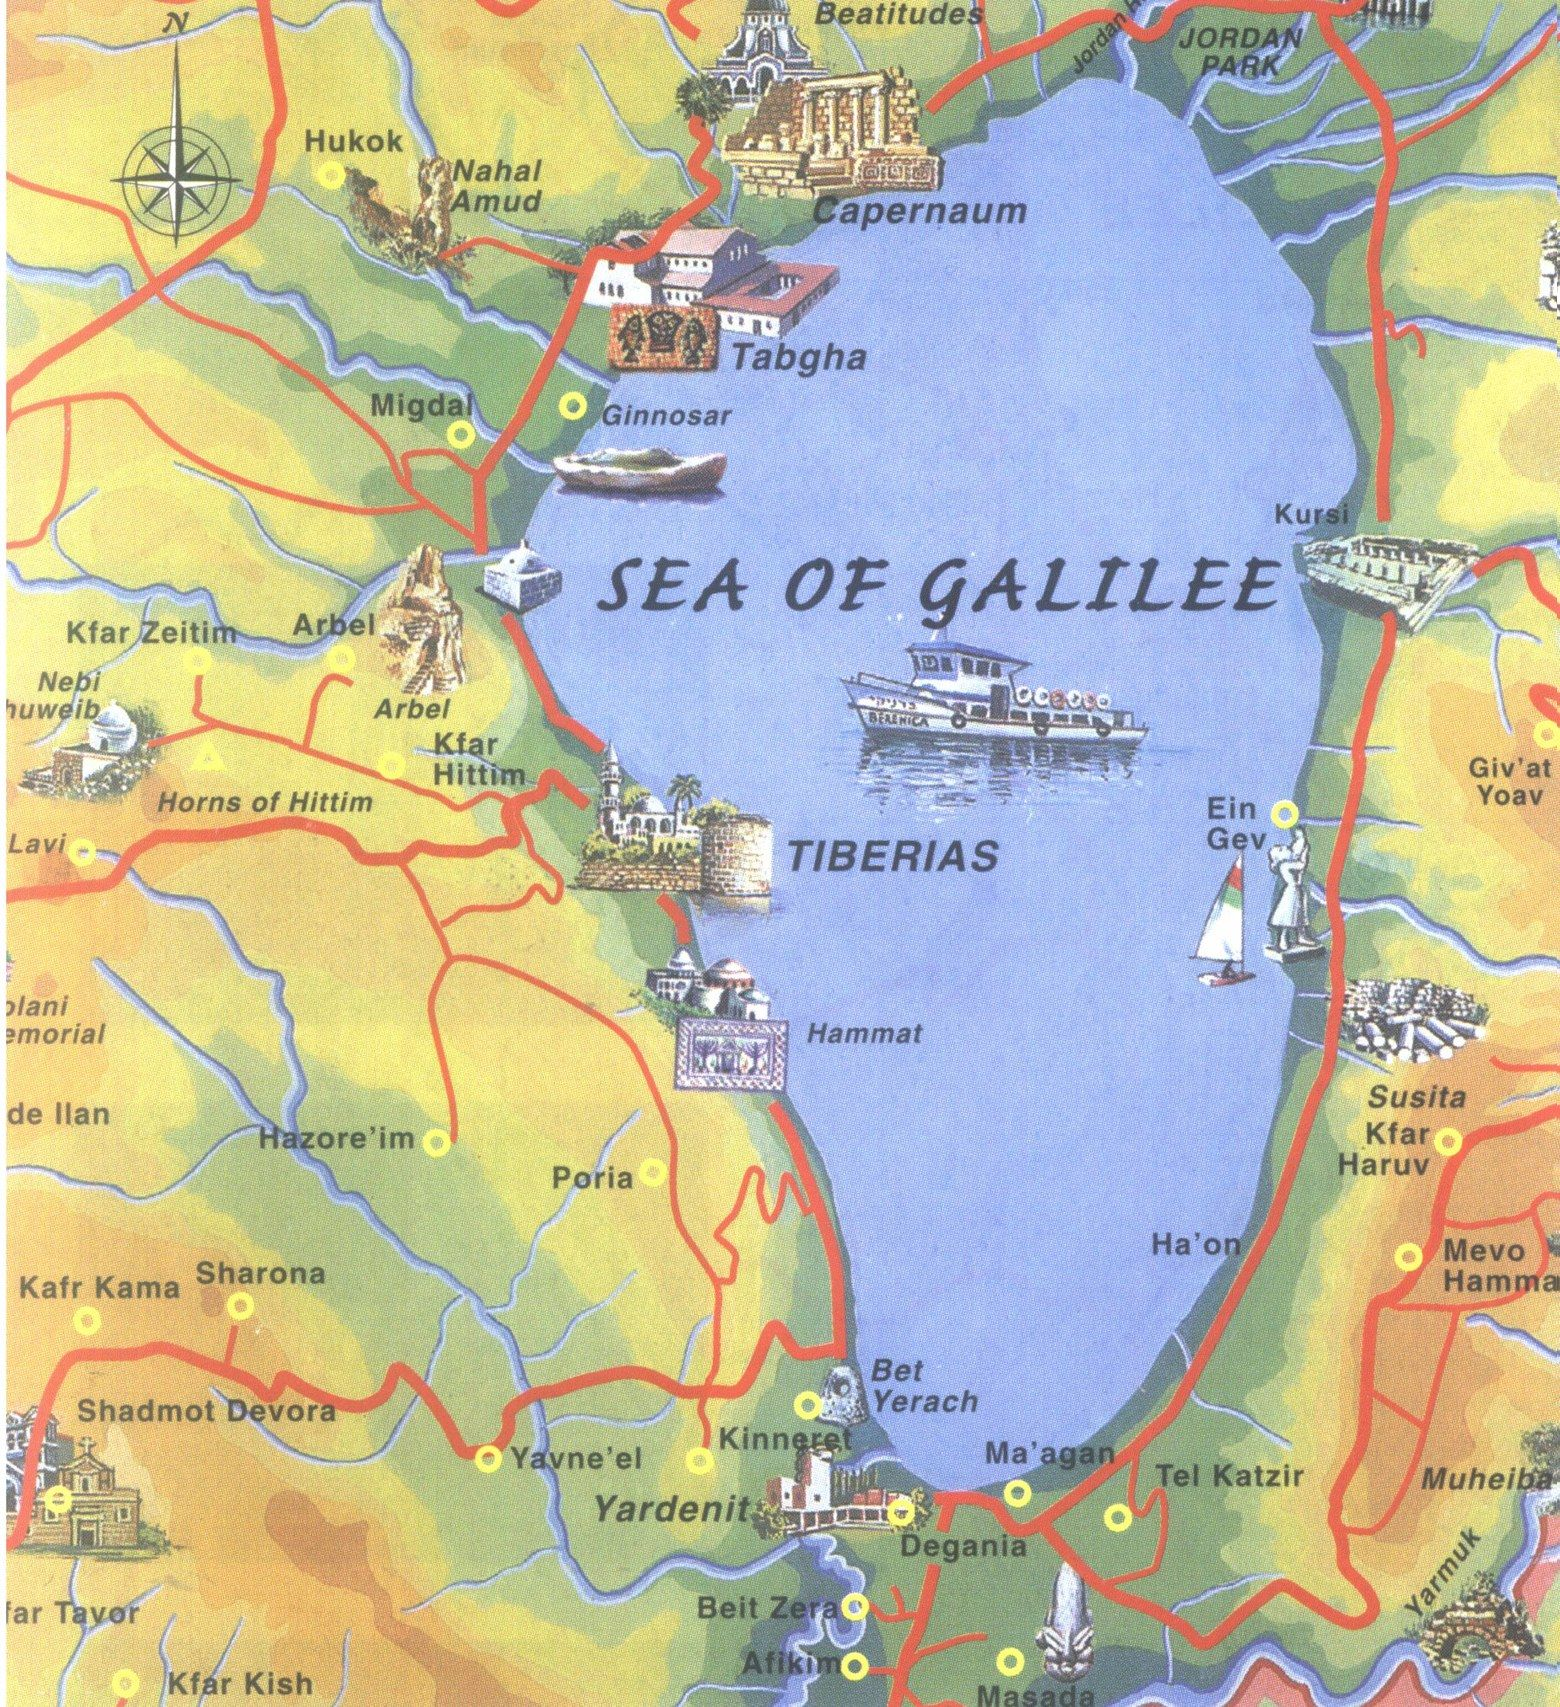 mt beatitudes map sea of galilee ccf in israel jon s israel